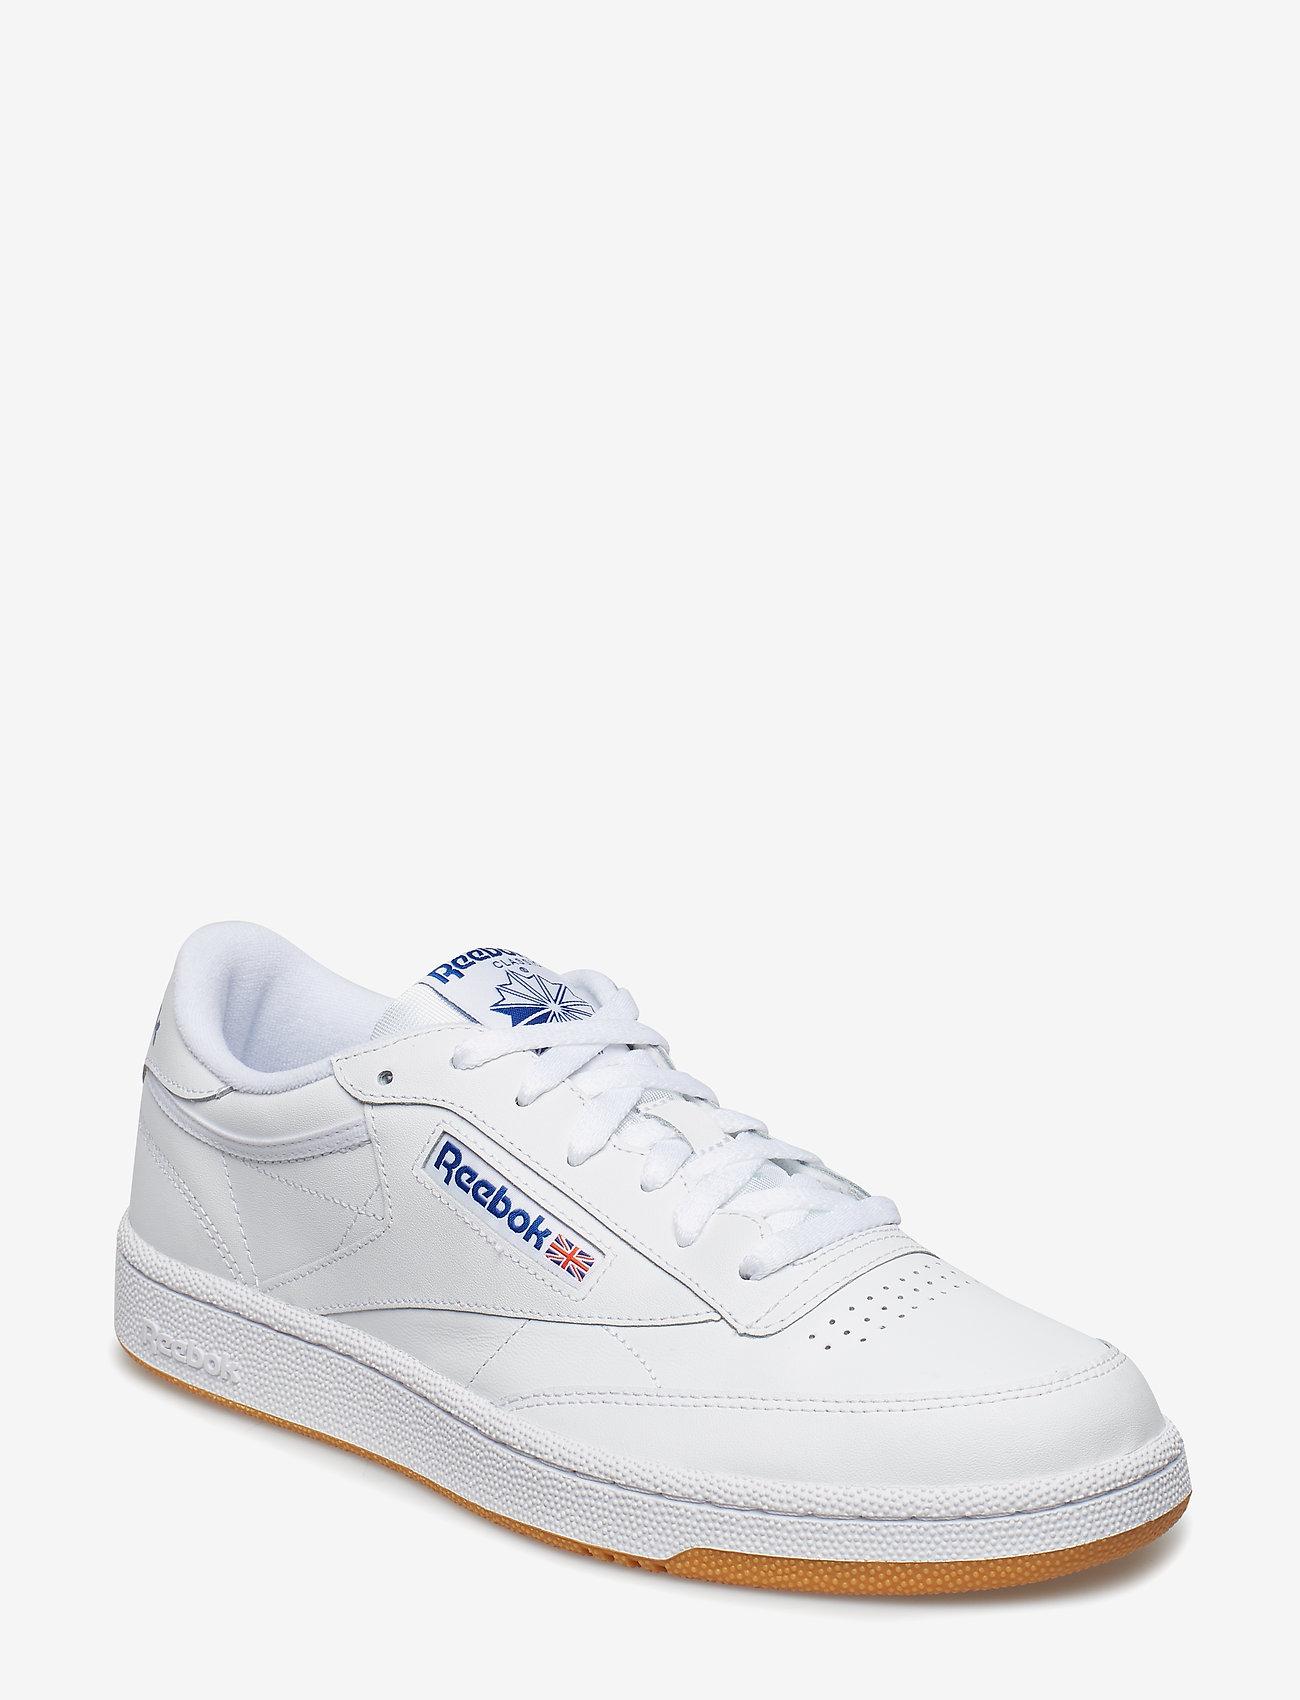 Reebok Classics - CLUB C 85 - laag sneakers - white/royal/gum - 0